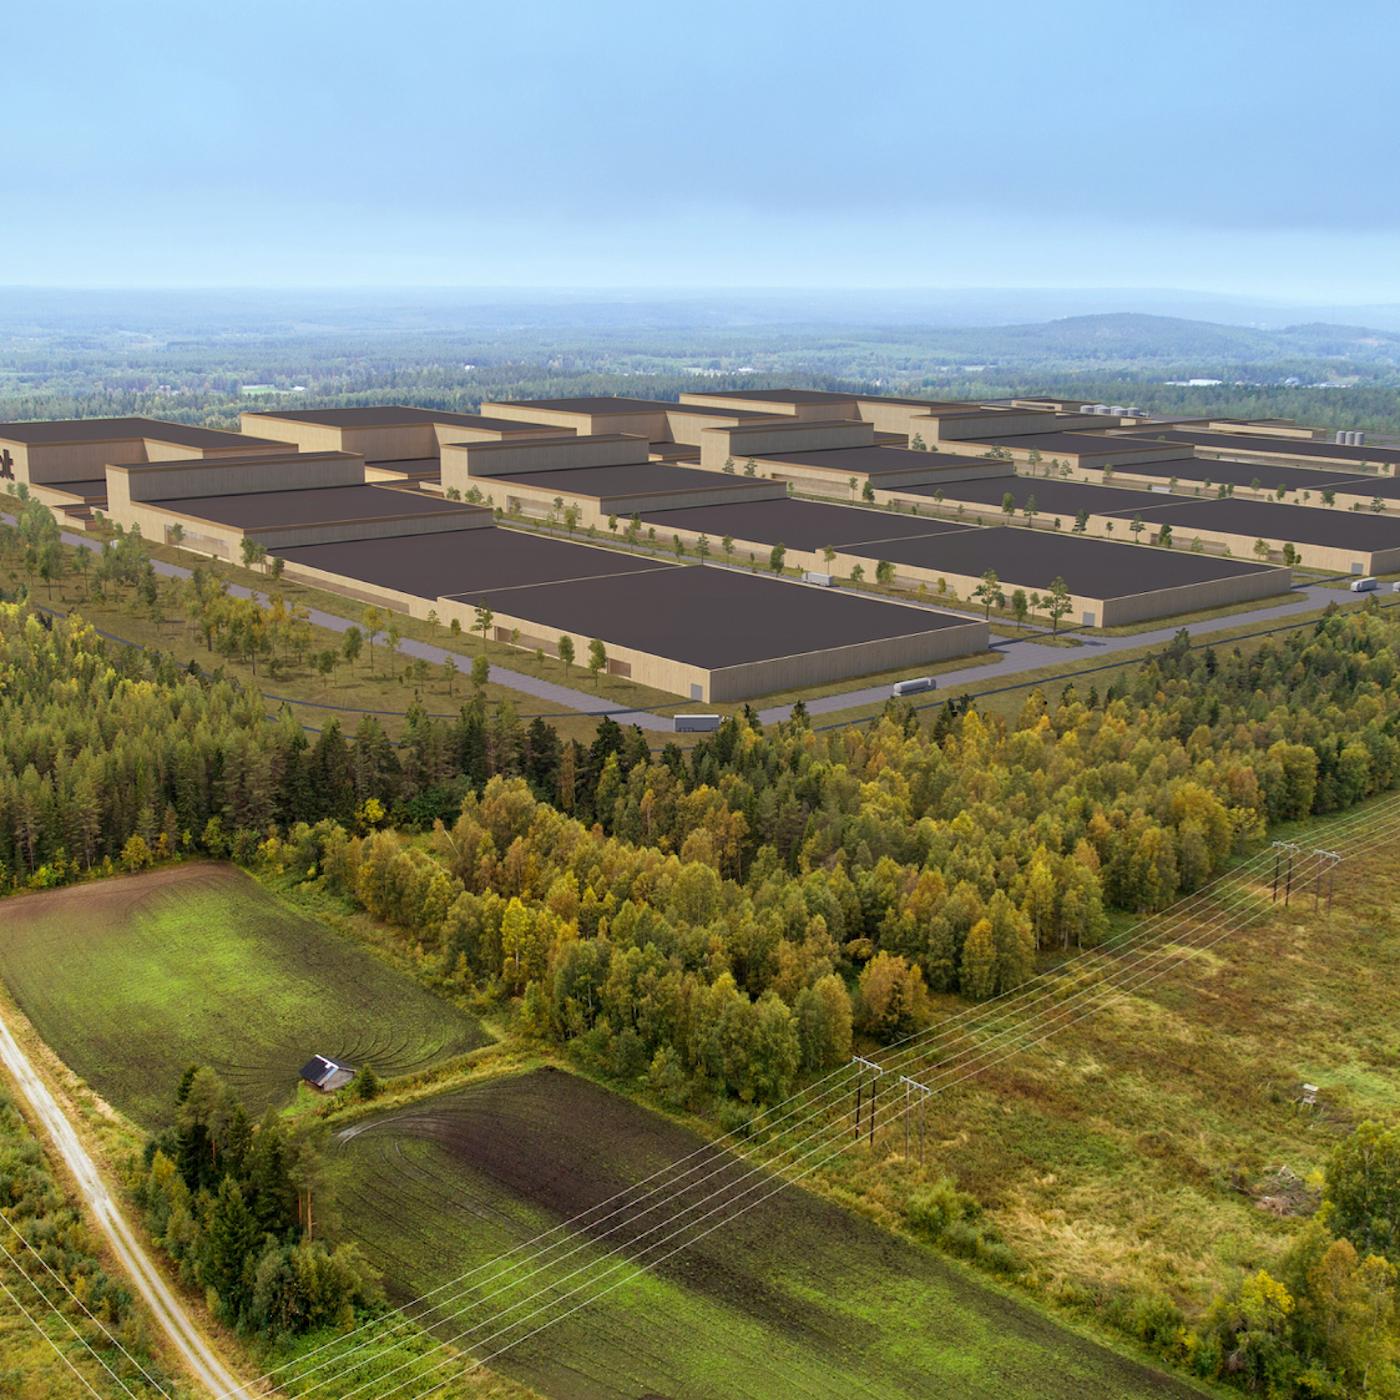 Kan en batterifabrik ge Norrland ny energi?